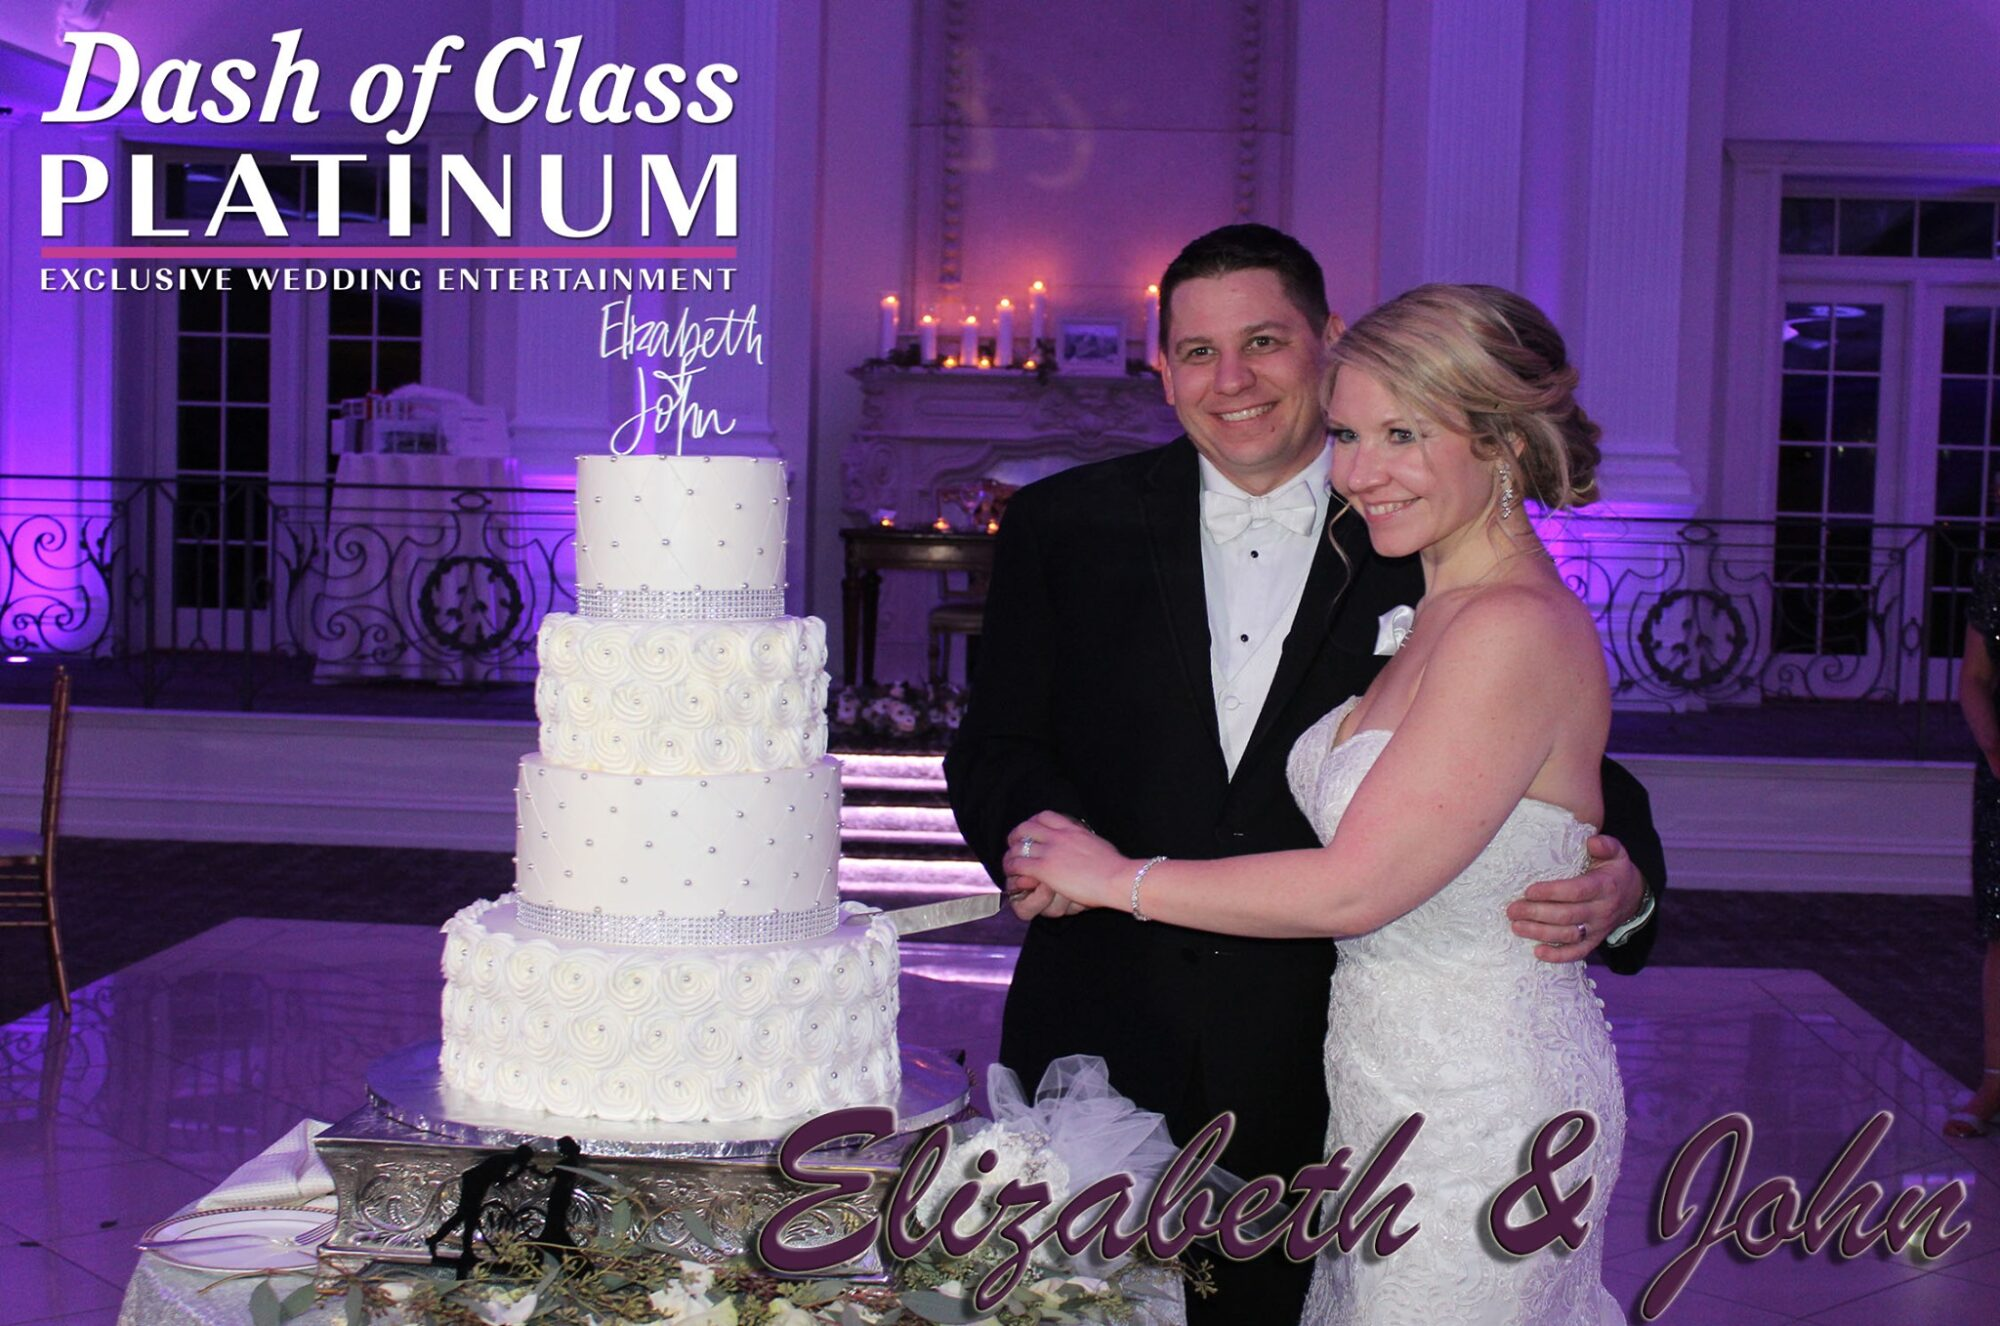 645-Dash of class platinum wedding entertainment NJ